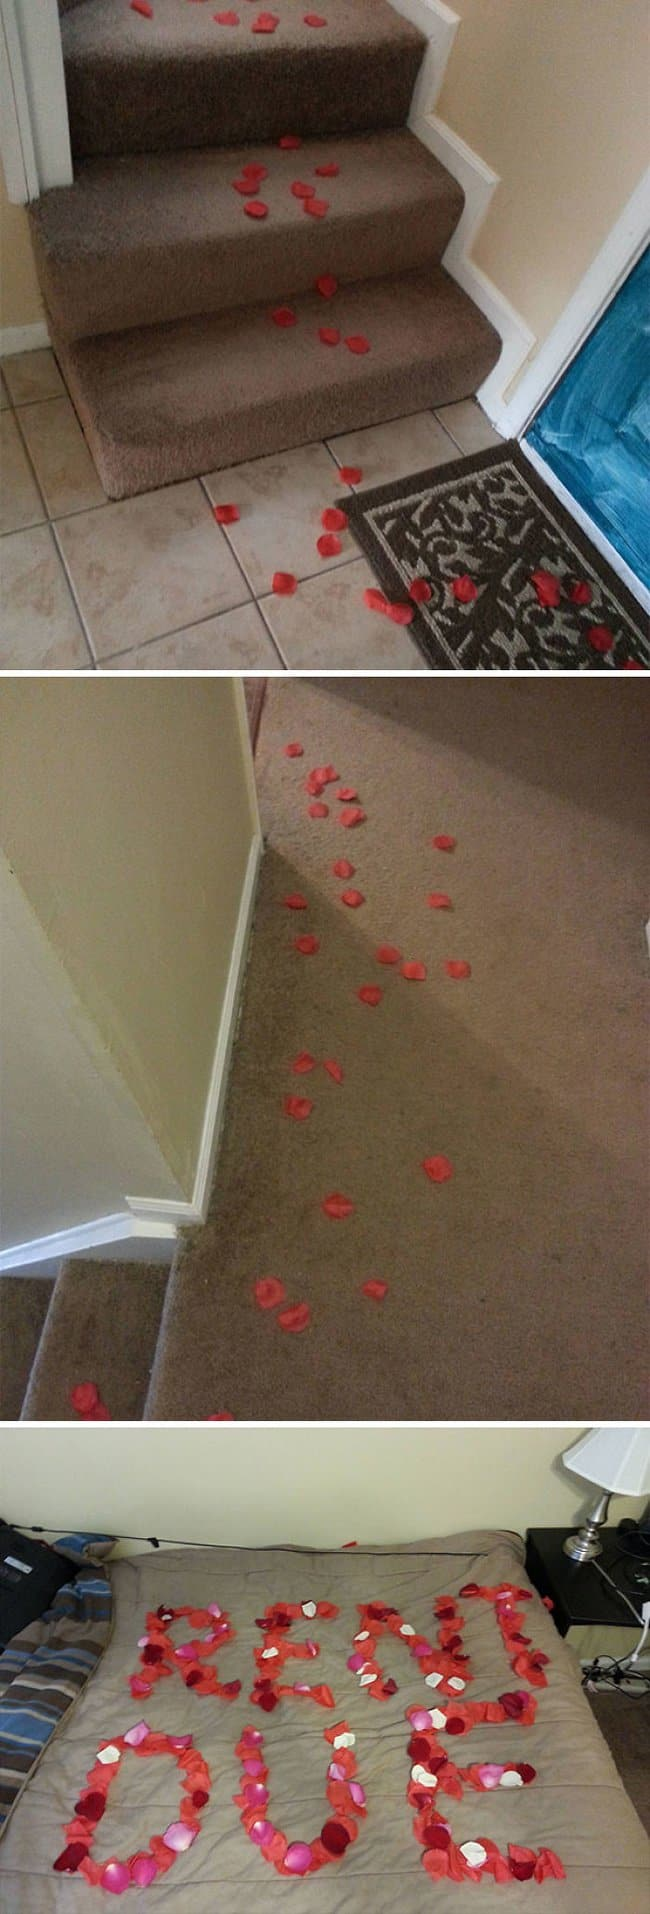 funny roommate pranks